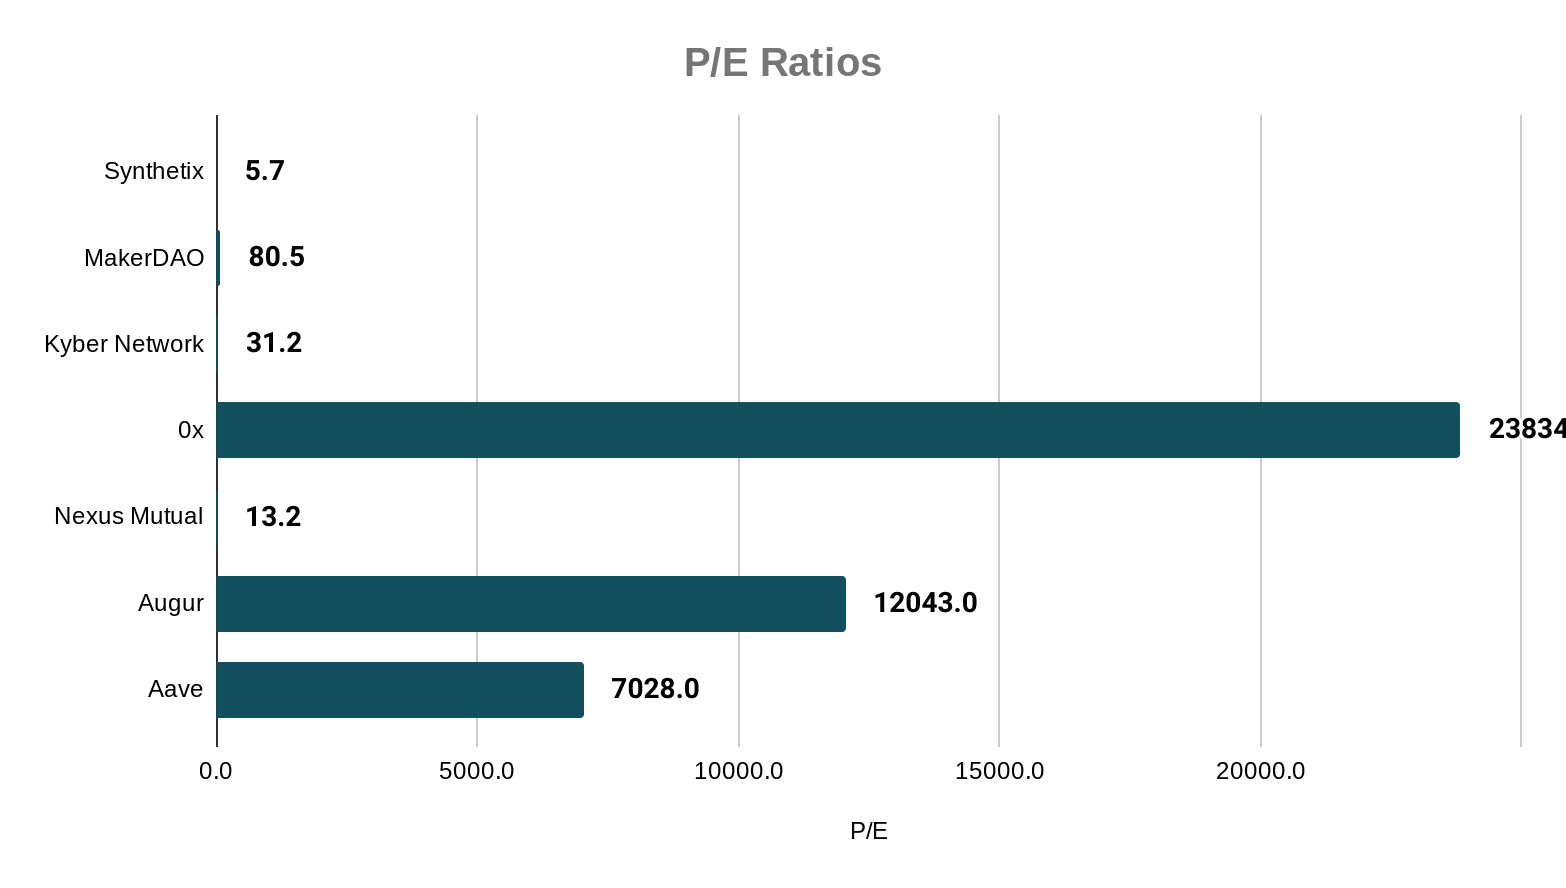 DeFi Token PE Ratios Compared